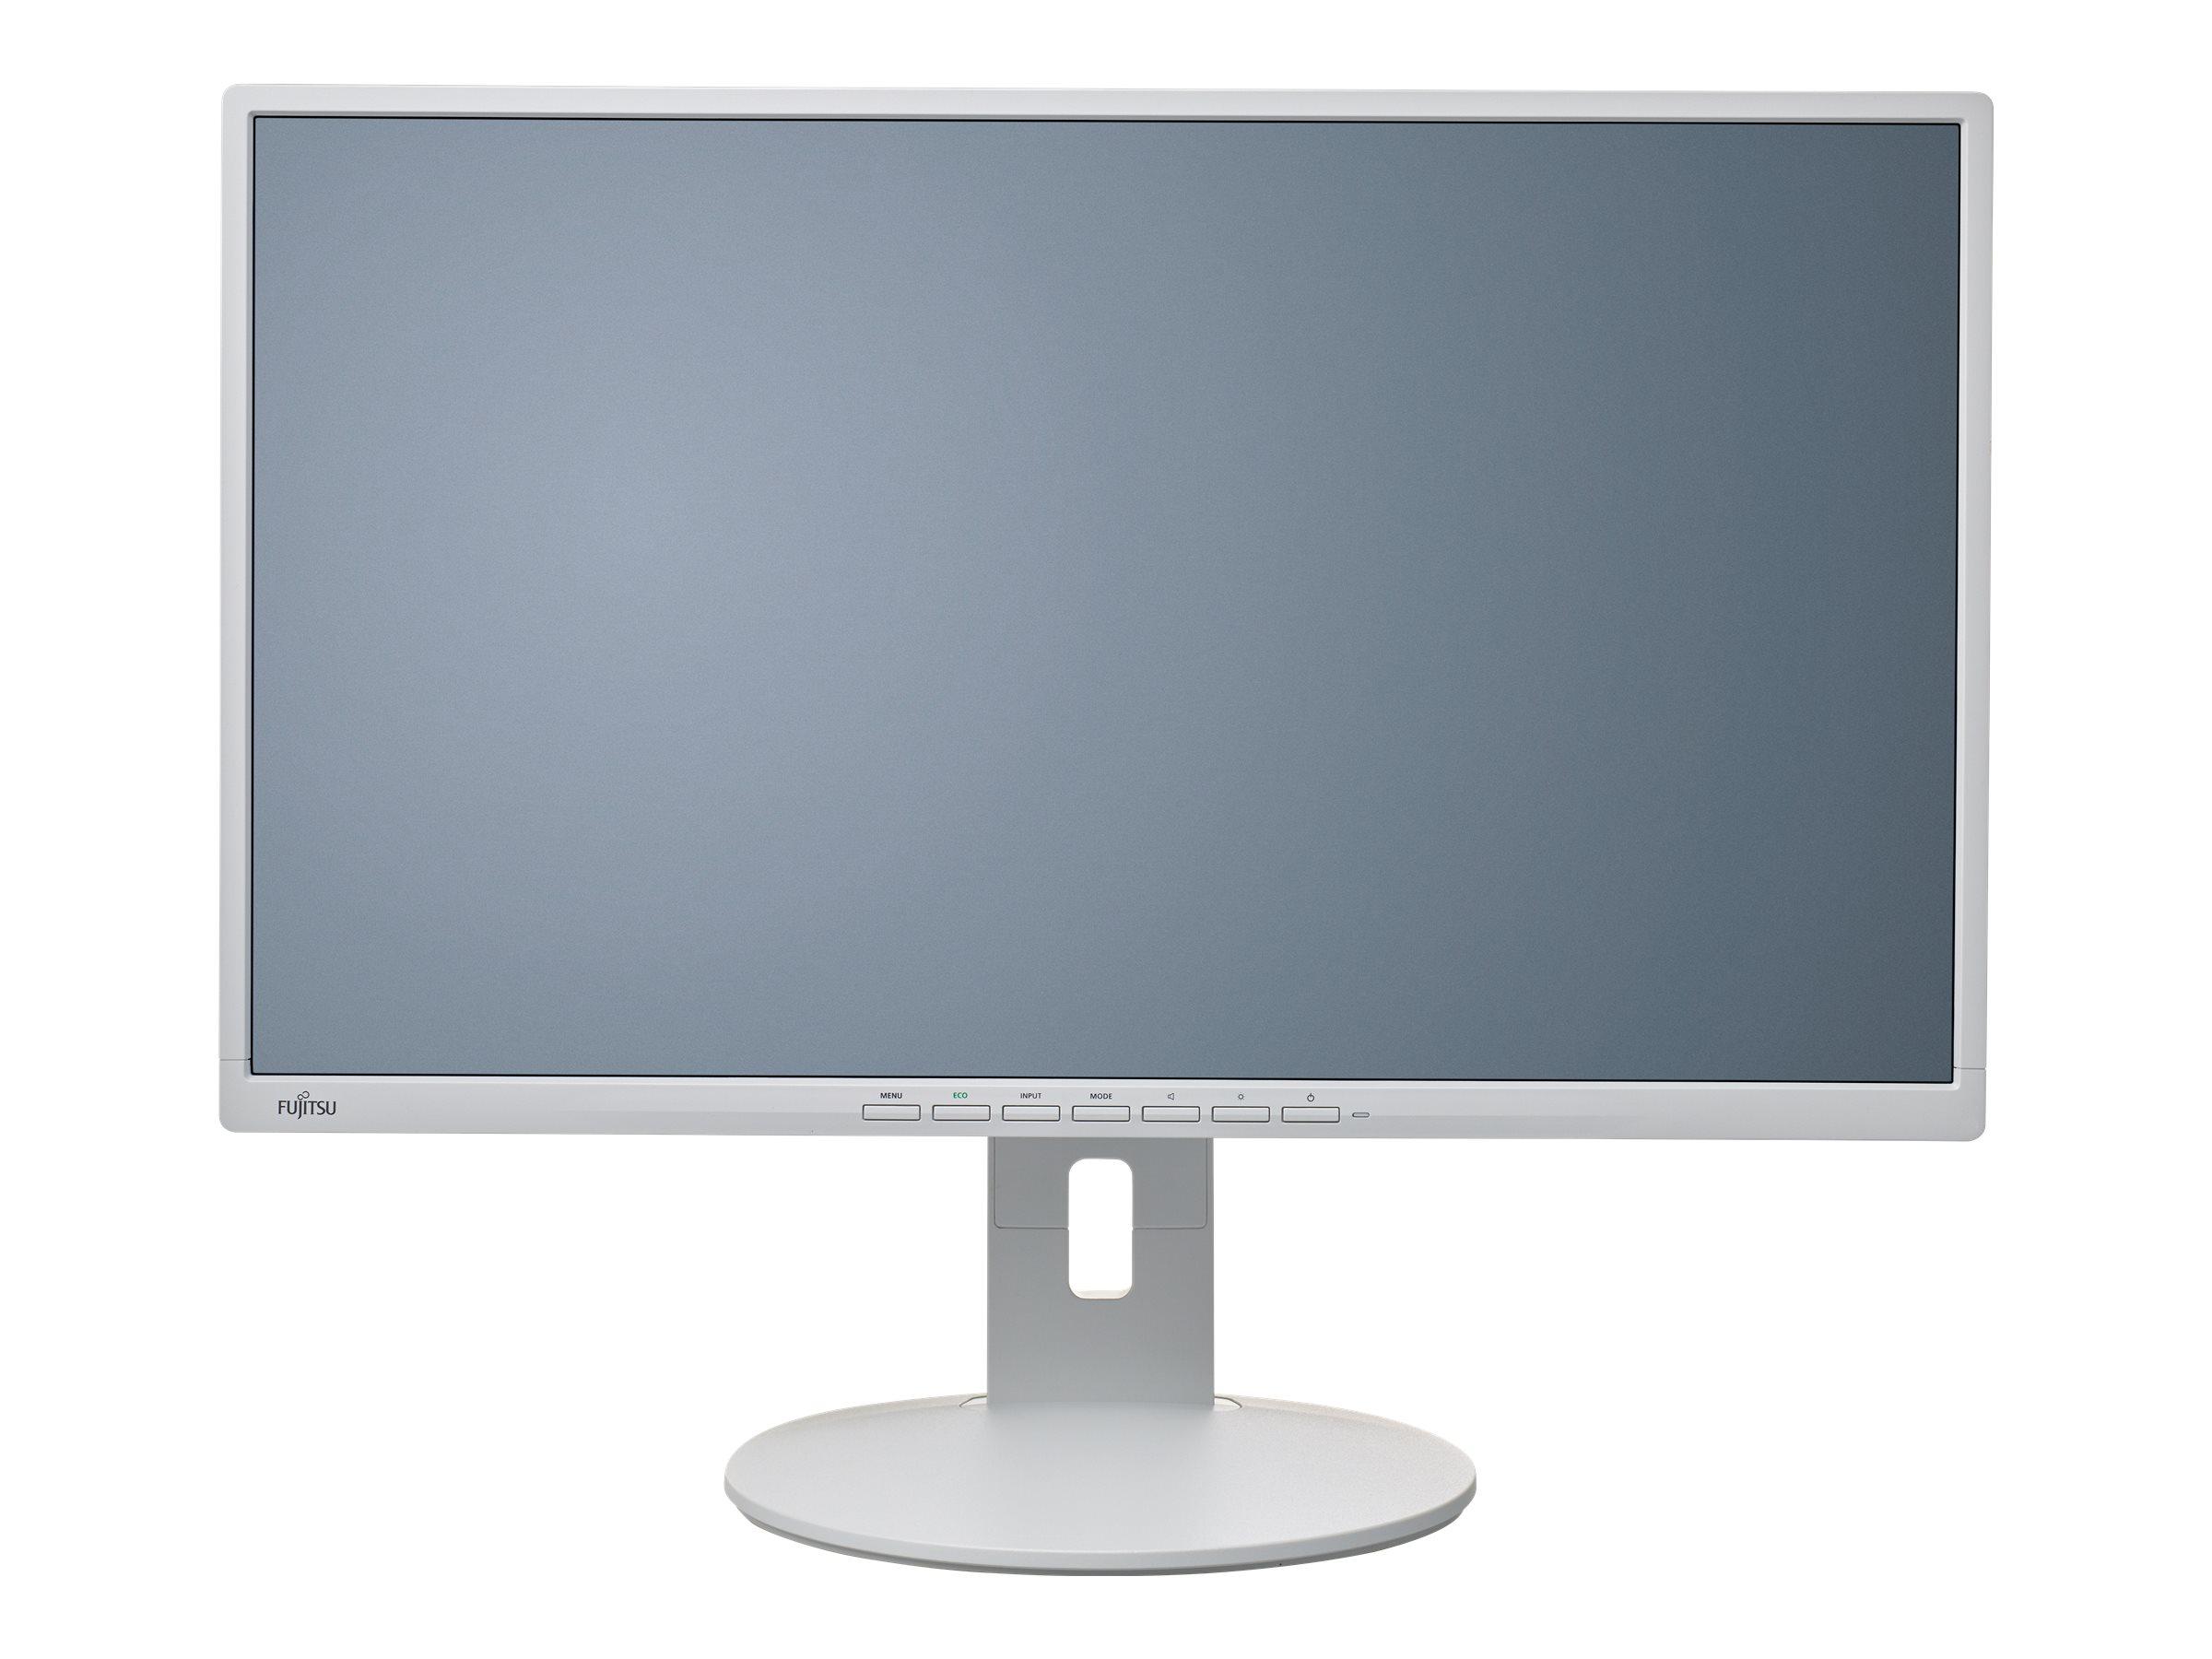 Fujitsu B27-8 TE Pro - Business Line - LED-Monitor - 68.6 cm (27